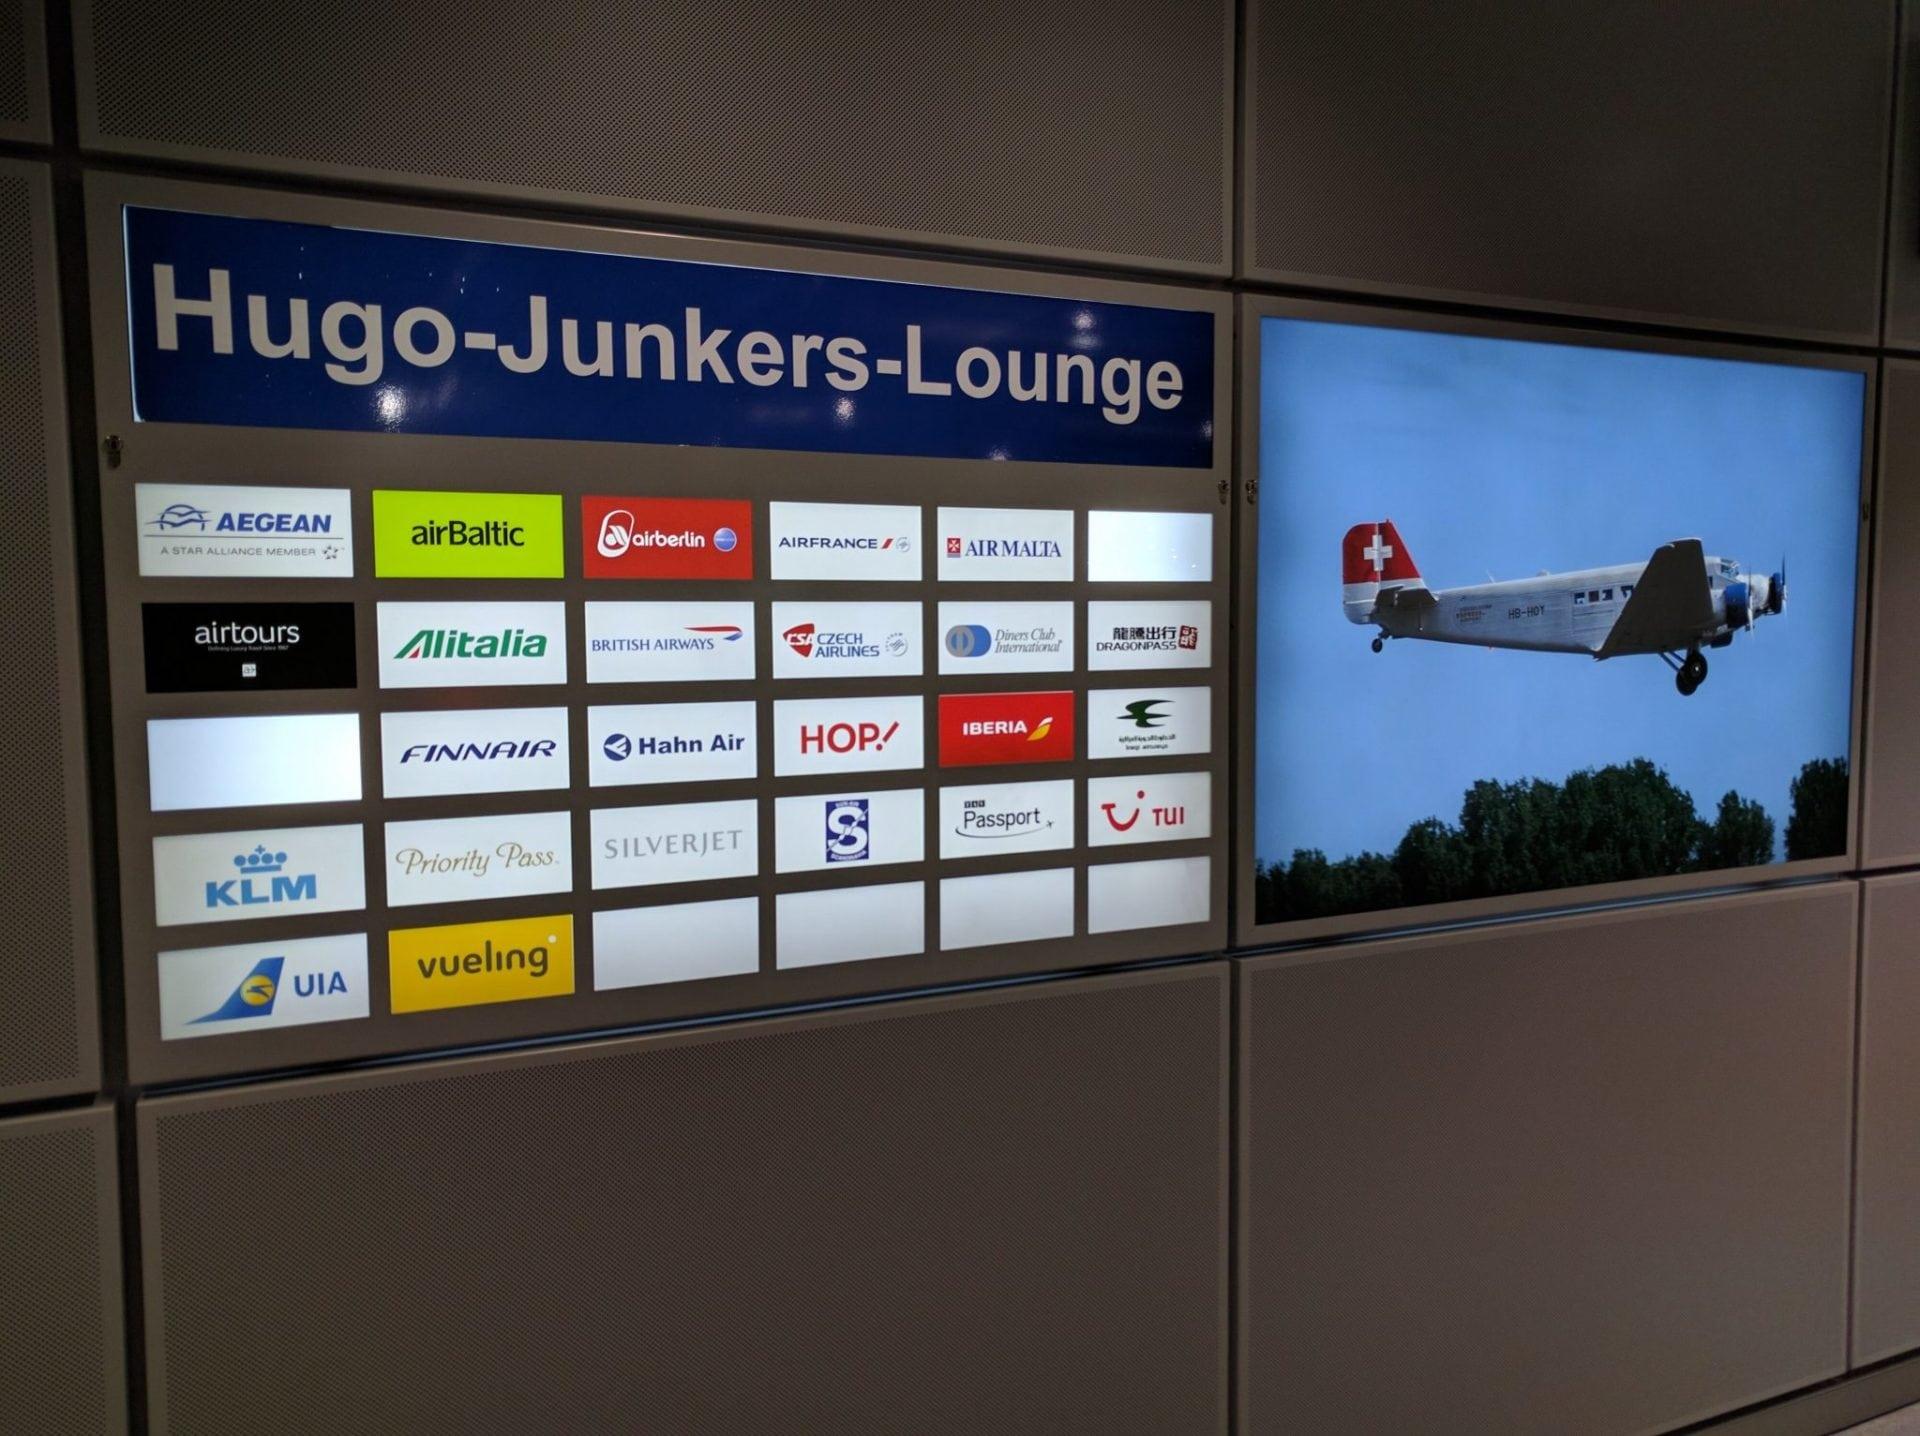 Hugo Junkers Lounge Düsseldorf Airlines